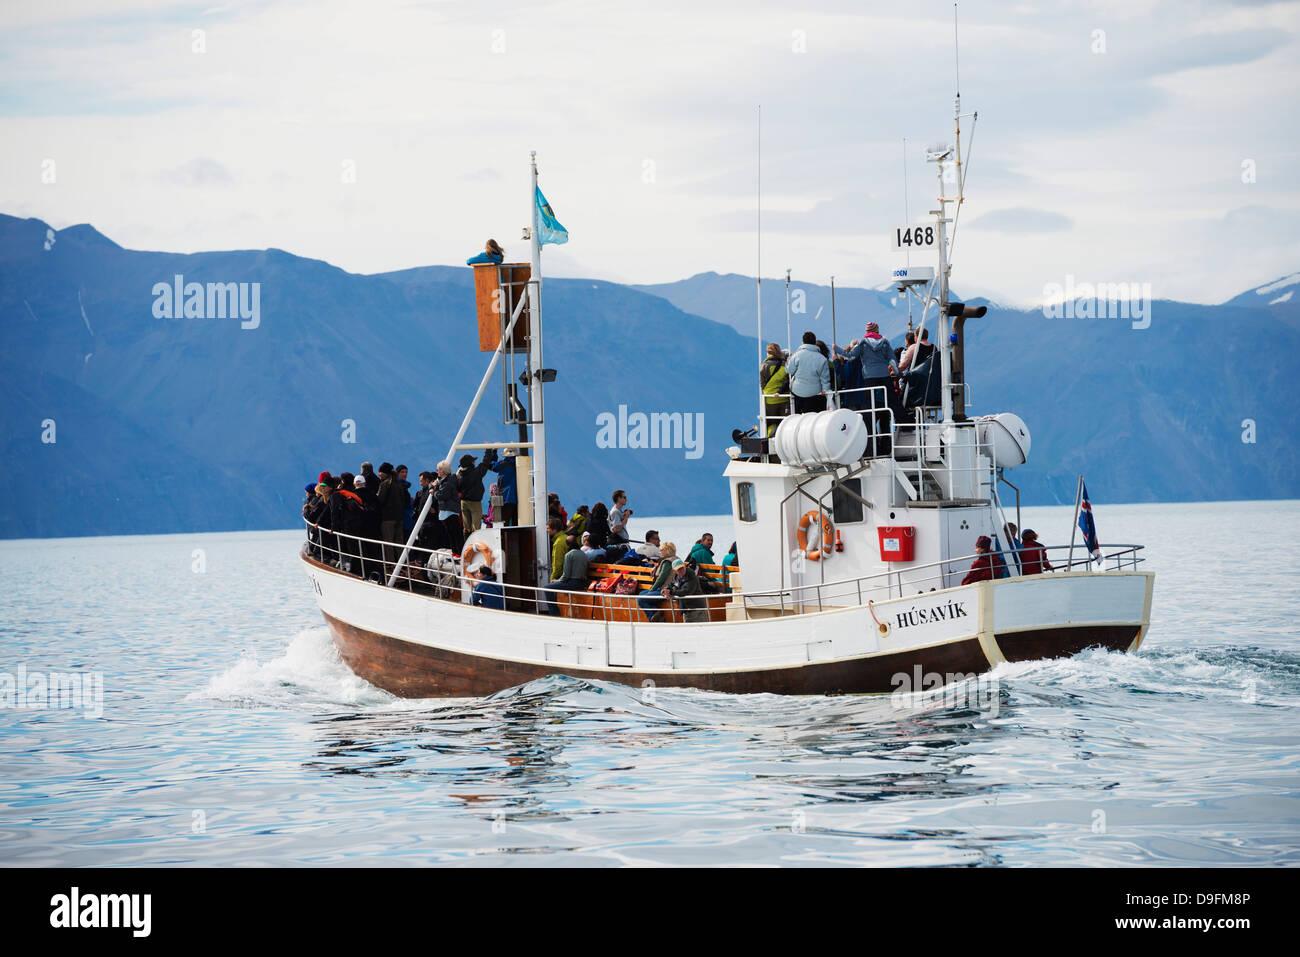 Whale watching Tour, Nordregion, Husavik, Island, Polarregionen Stockbild